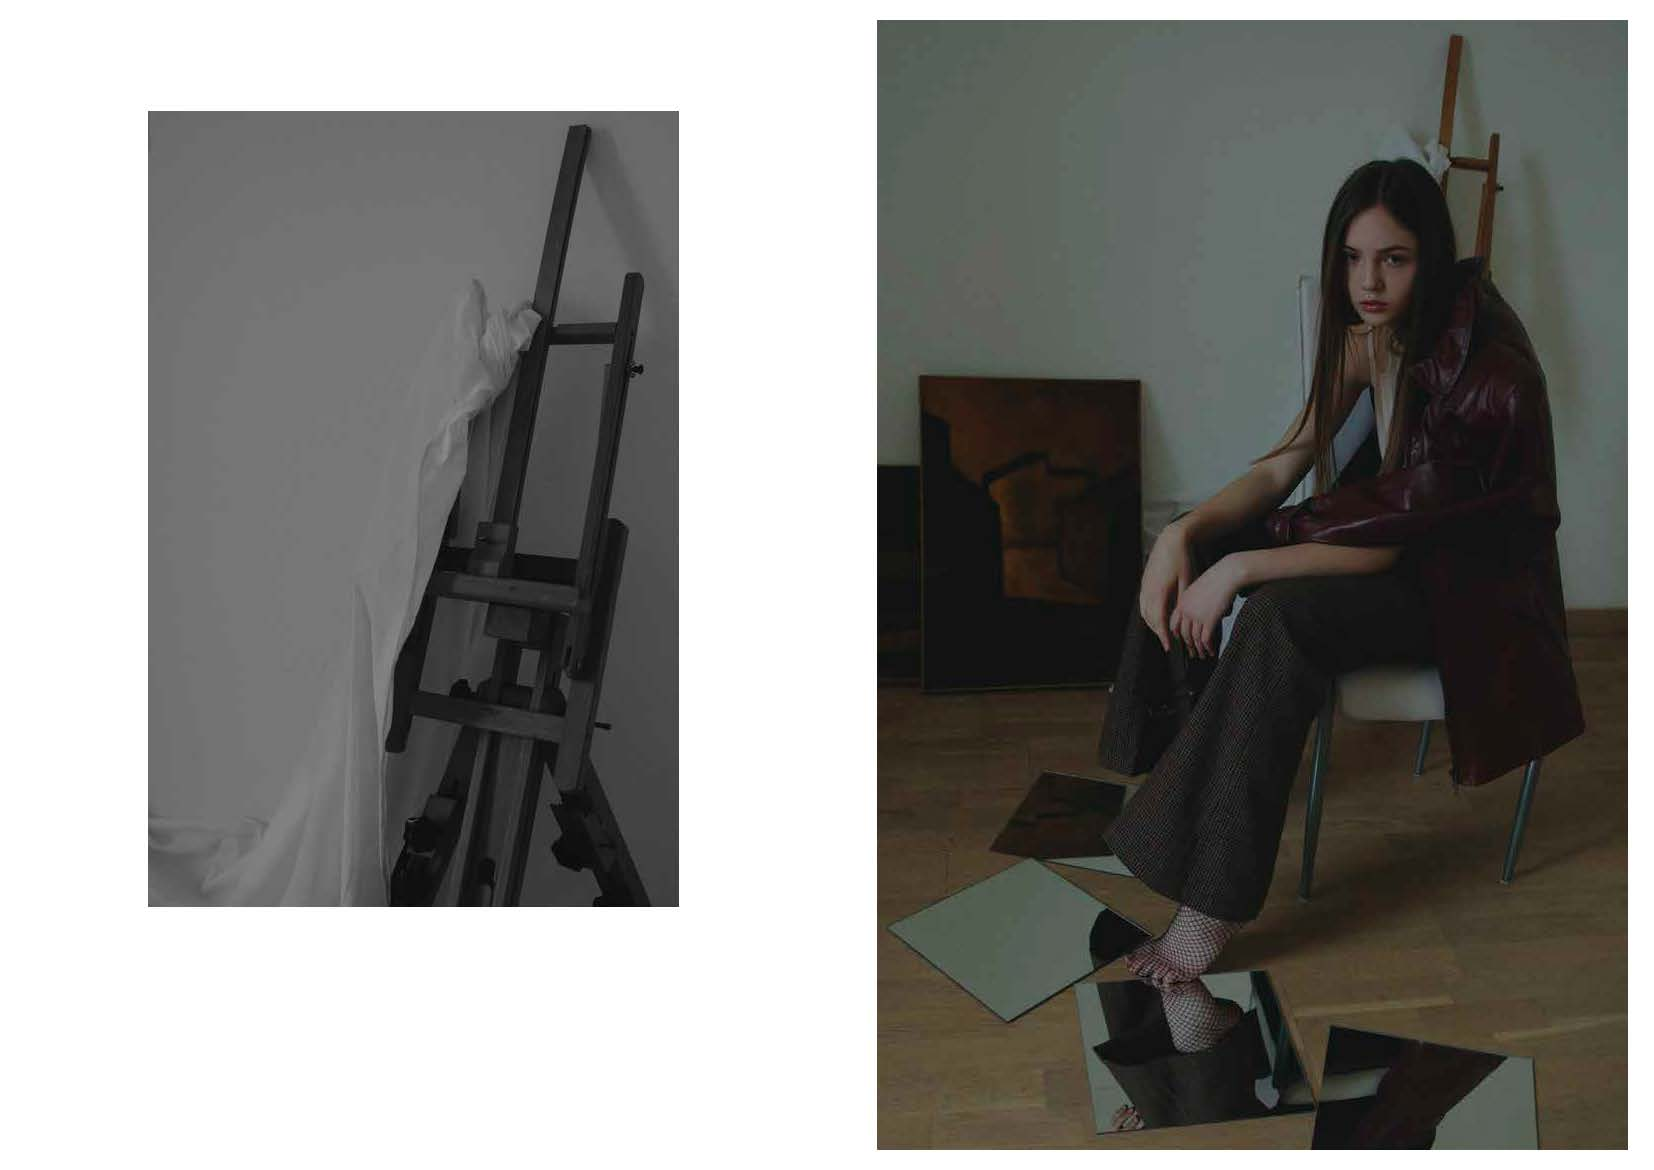 jacket STYLIST ARCHIVE, top ACNE STUDIOS, trousers SOHO DE LUXE, fishnet stockings STYLIST ARCHIVE